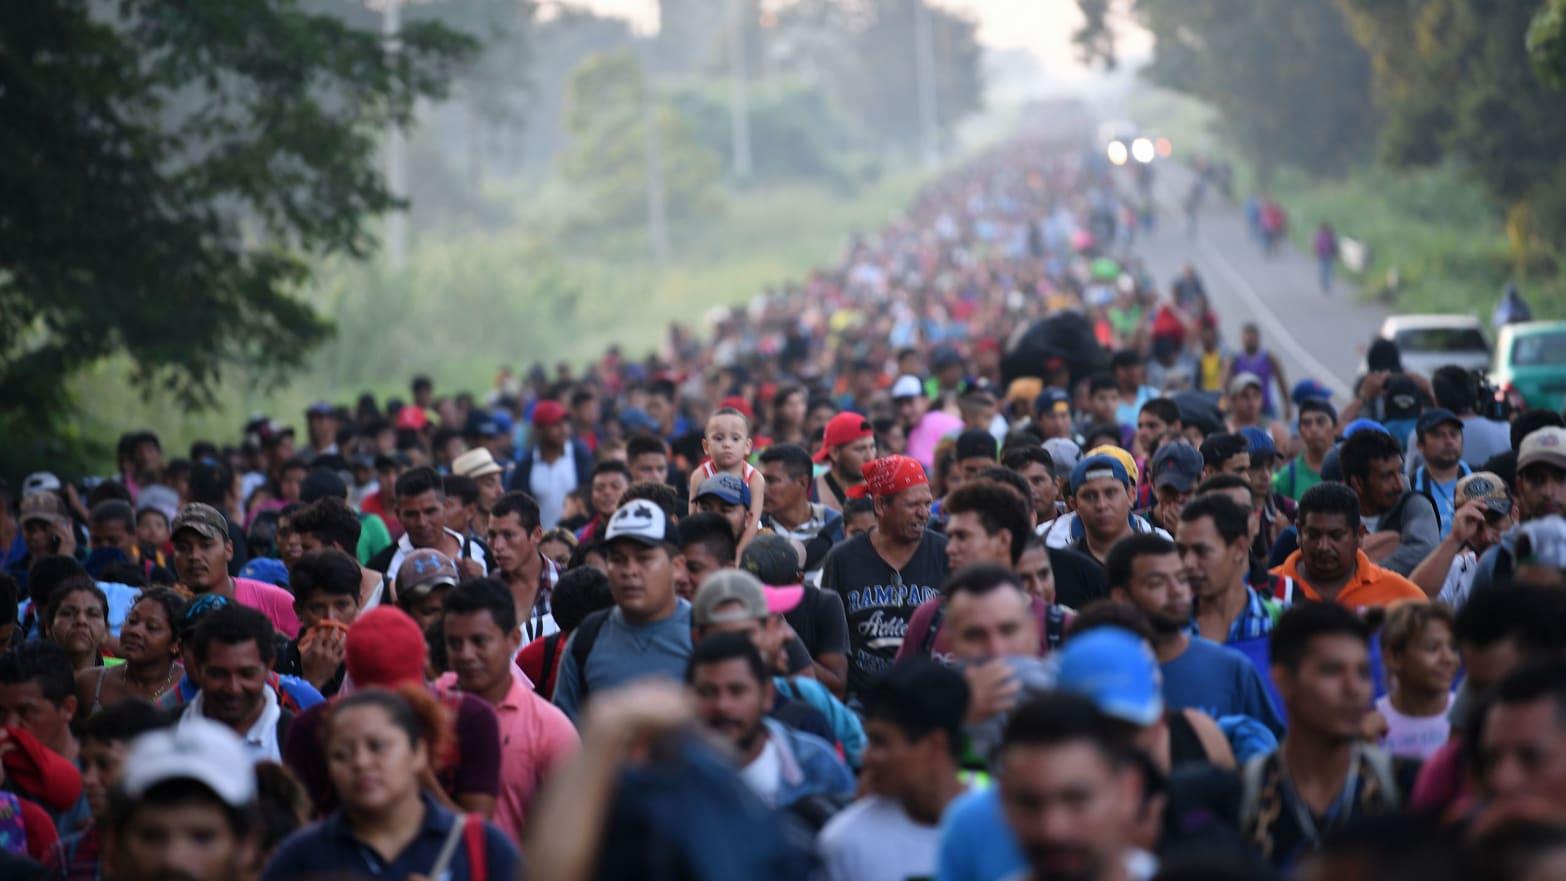 migrants wishing to move